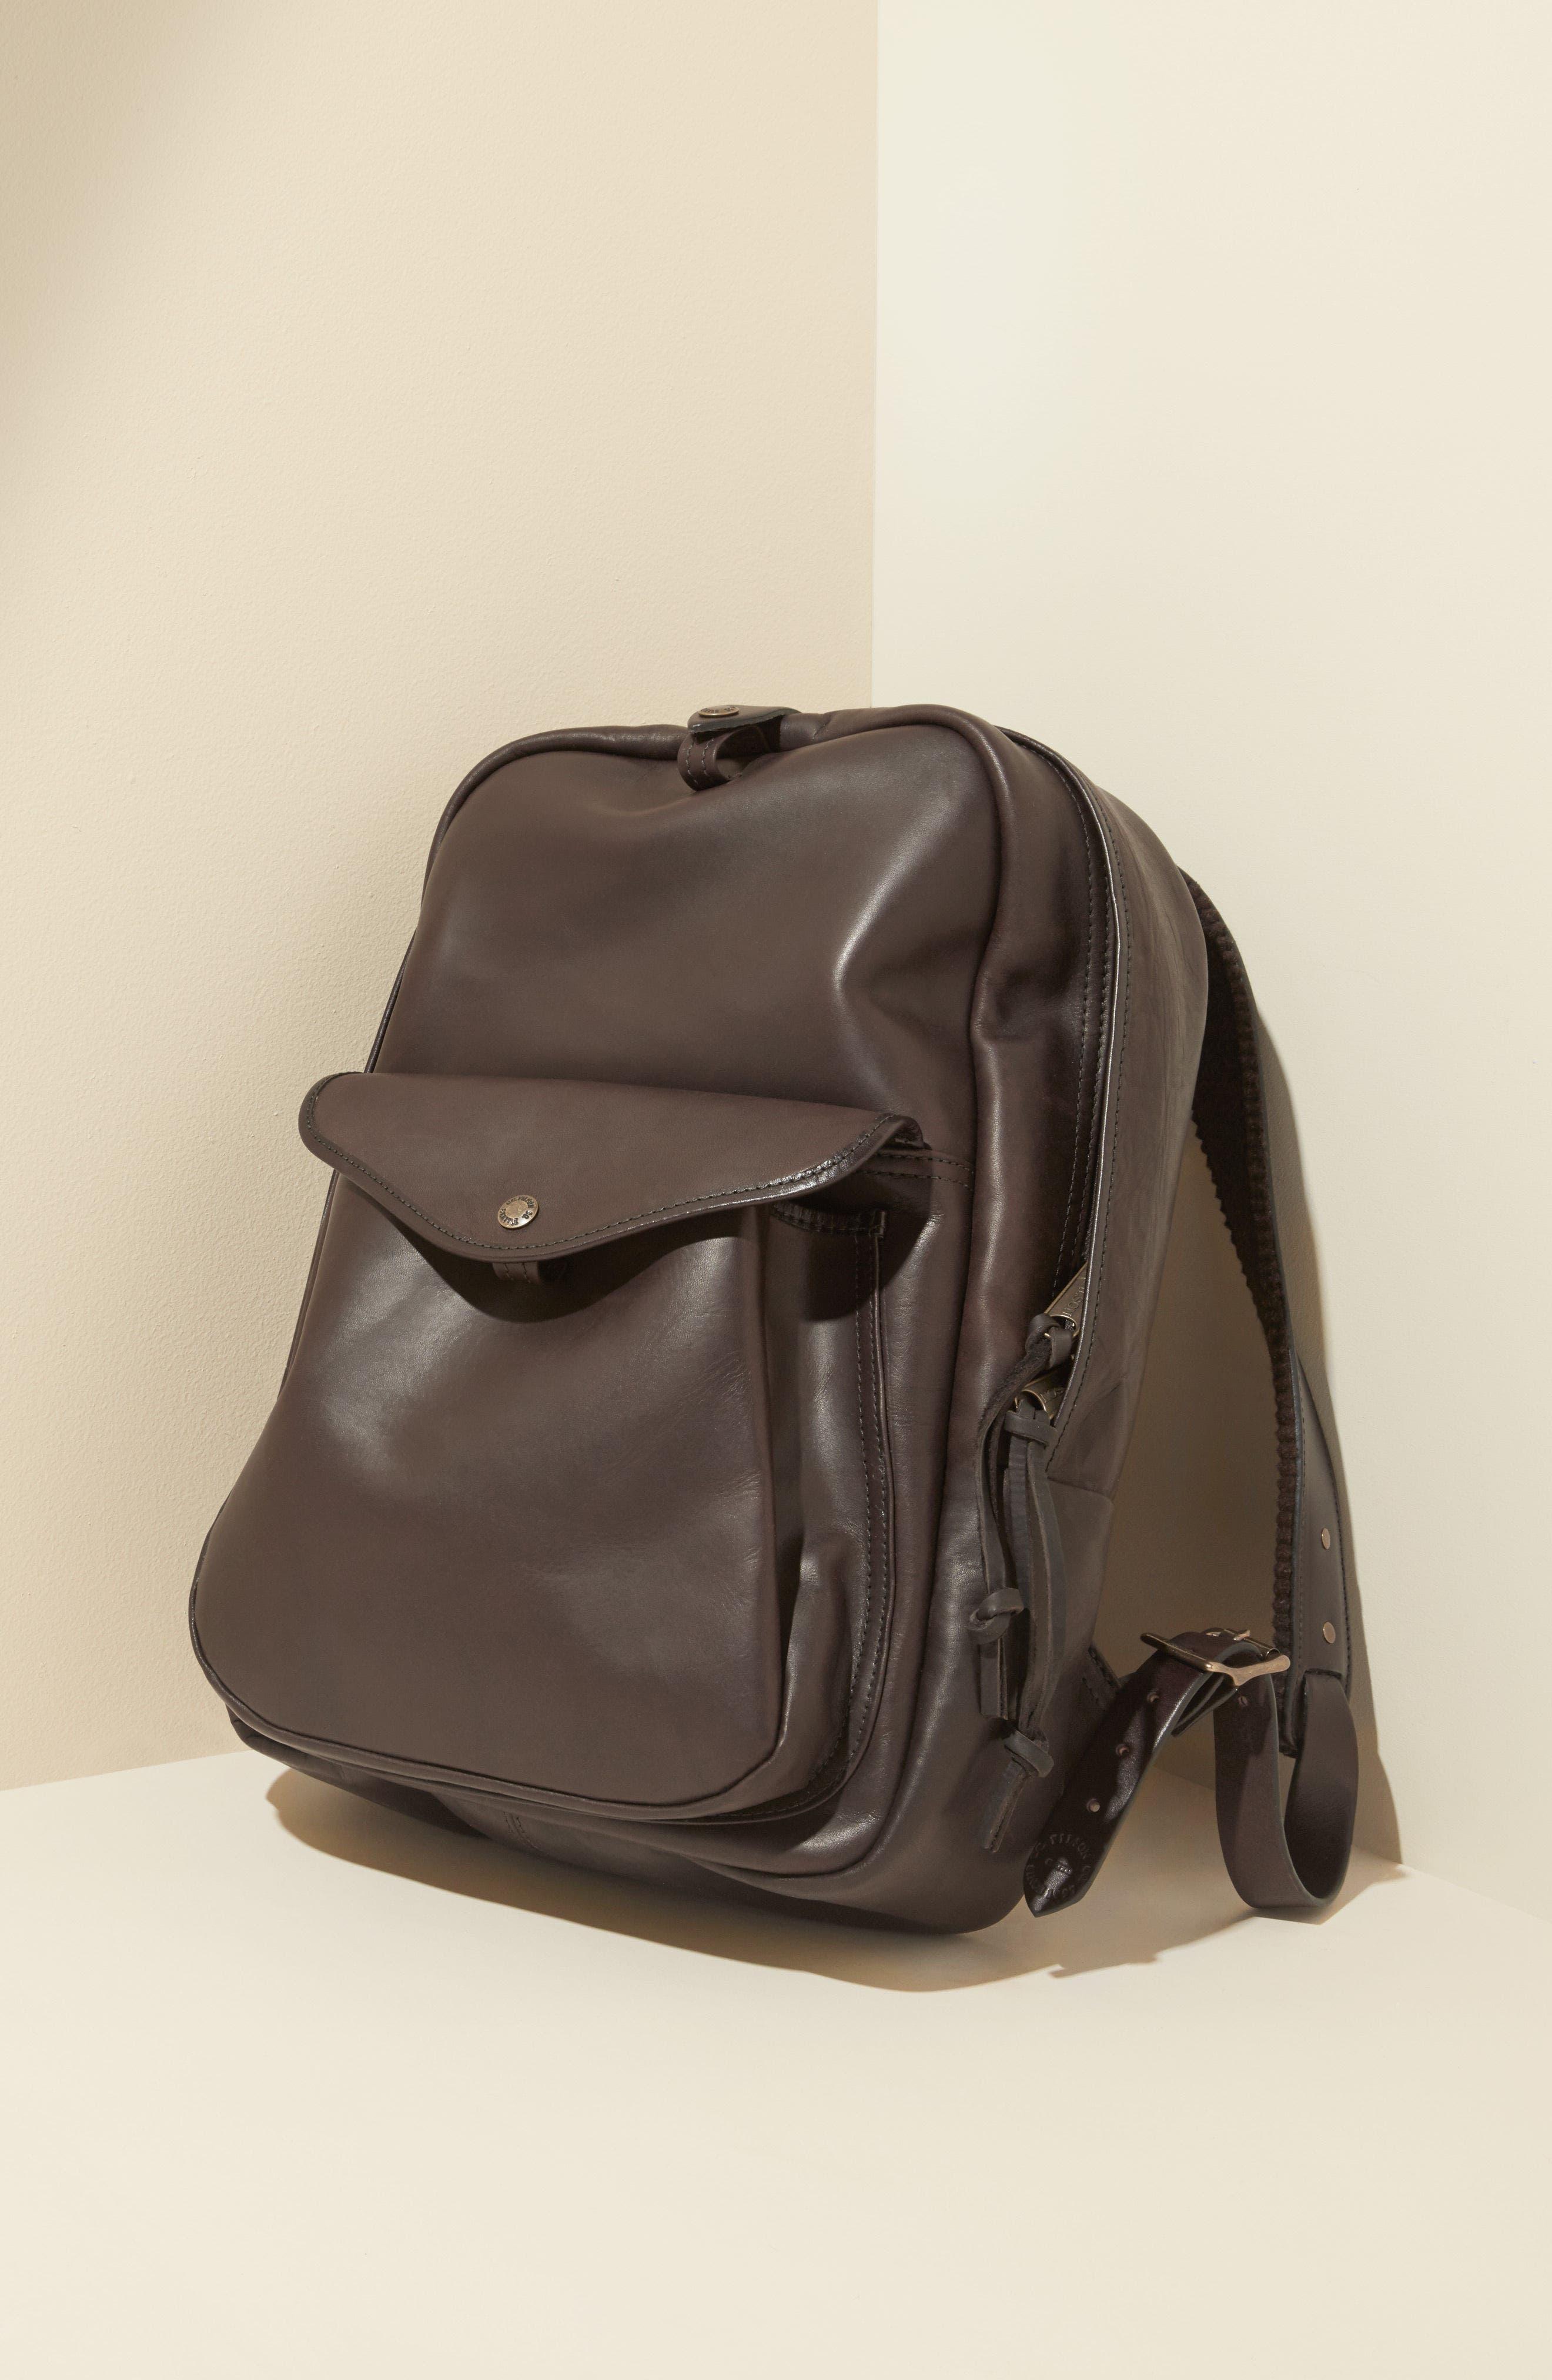 FILSON,                             Weatherproof Leather Backpack,                             Alternate thumbnail 5, color,                             206